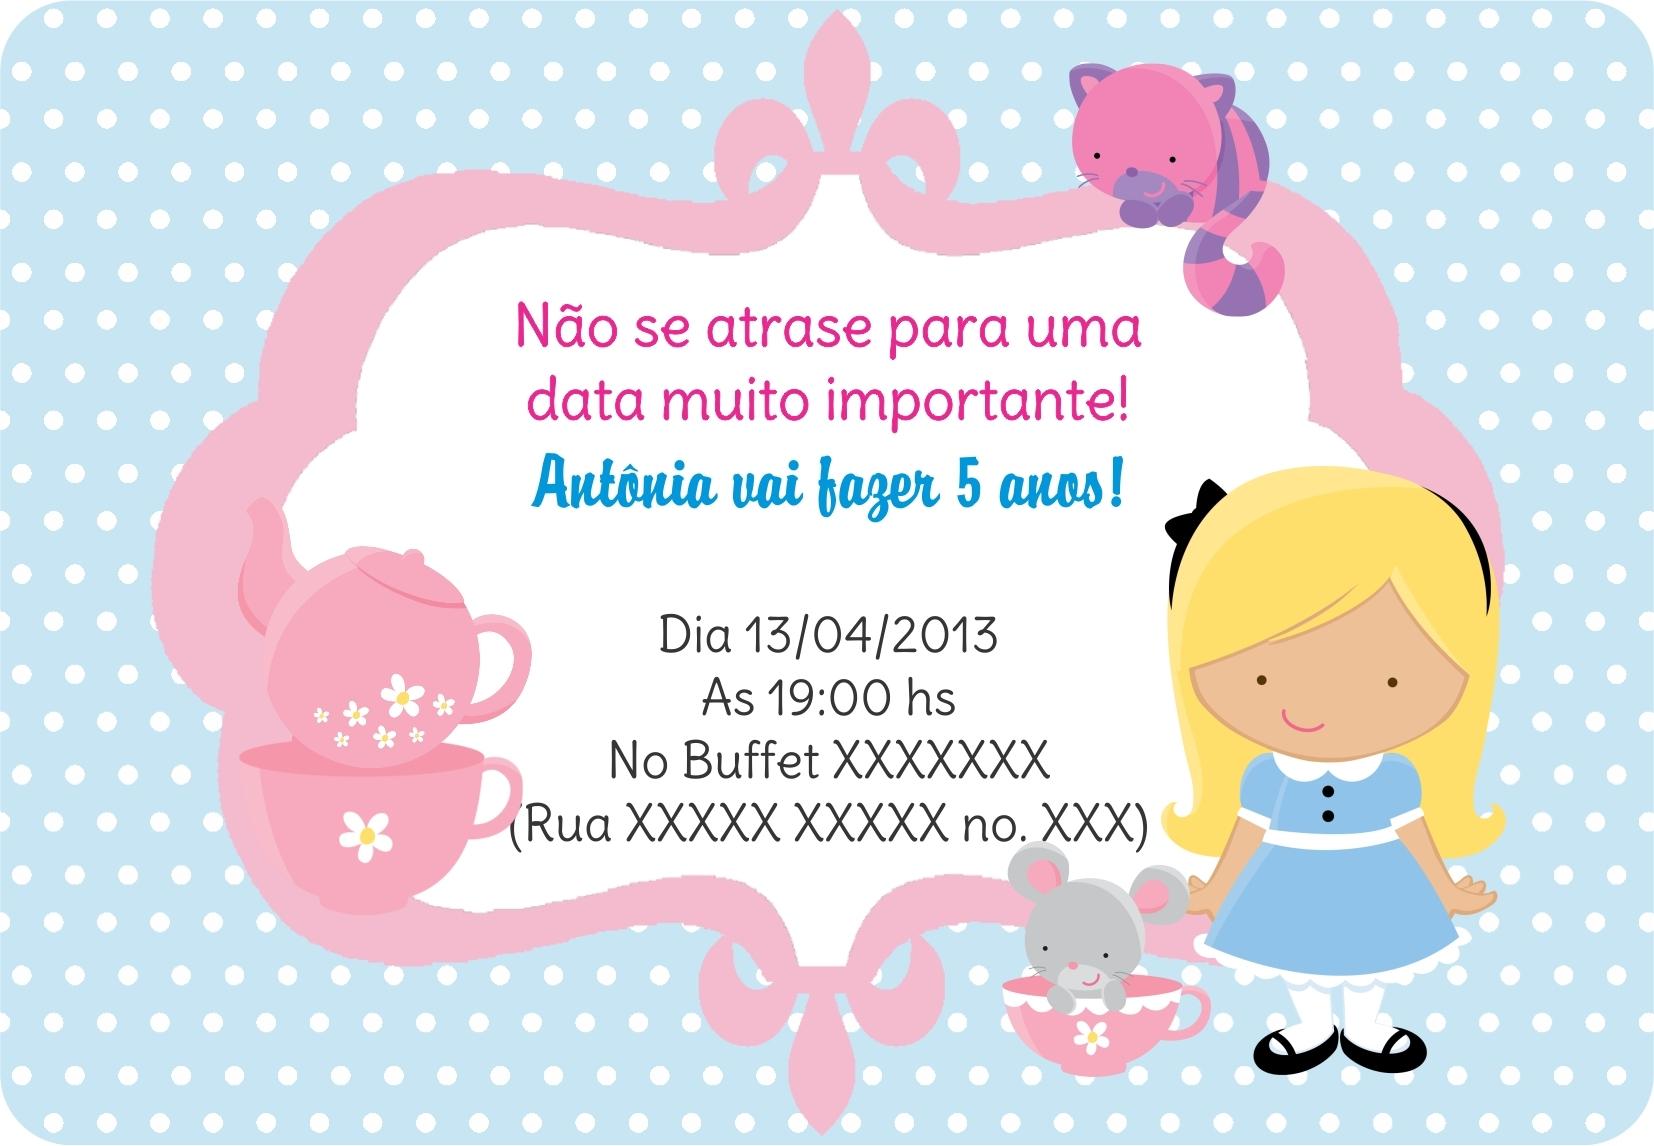 Alice In Wonderland Invitations Free Template with good invitation design